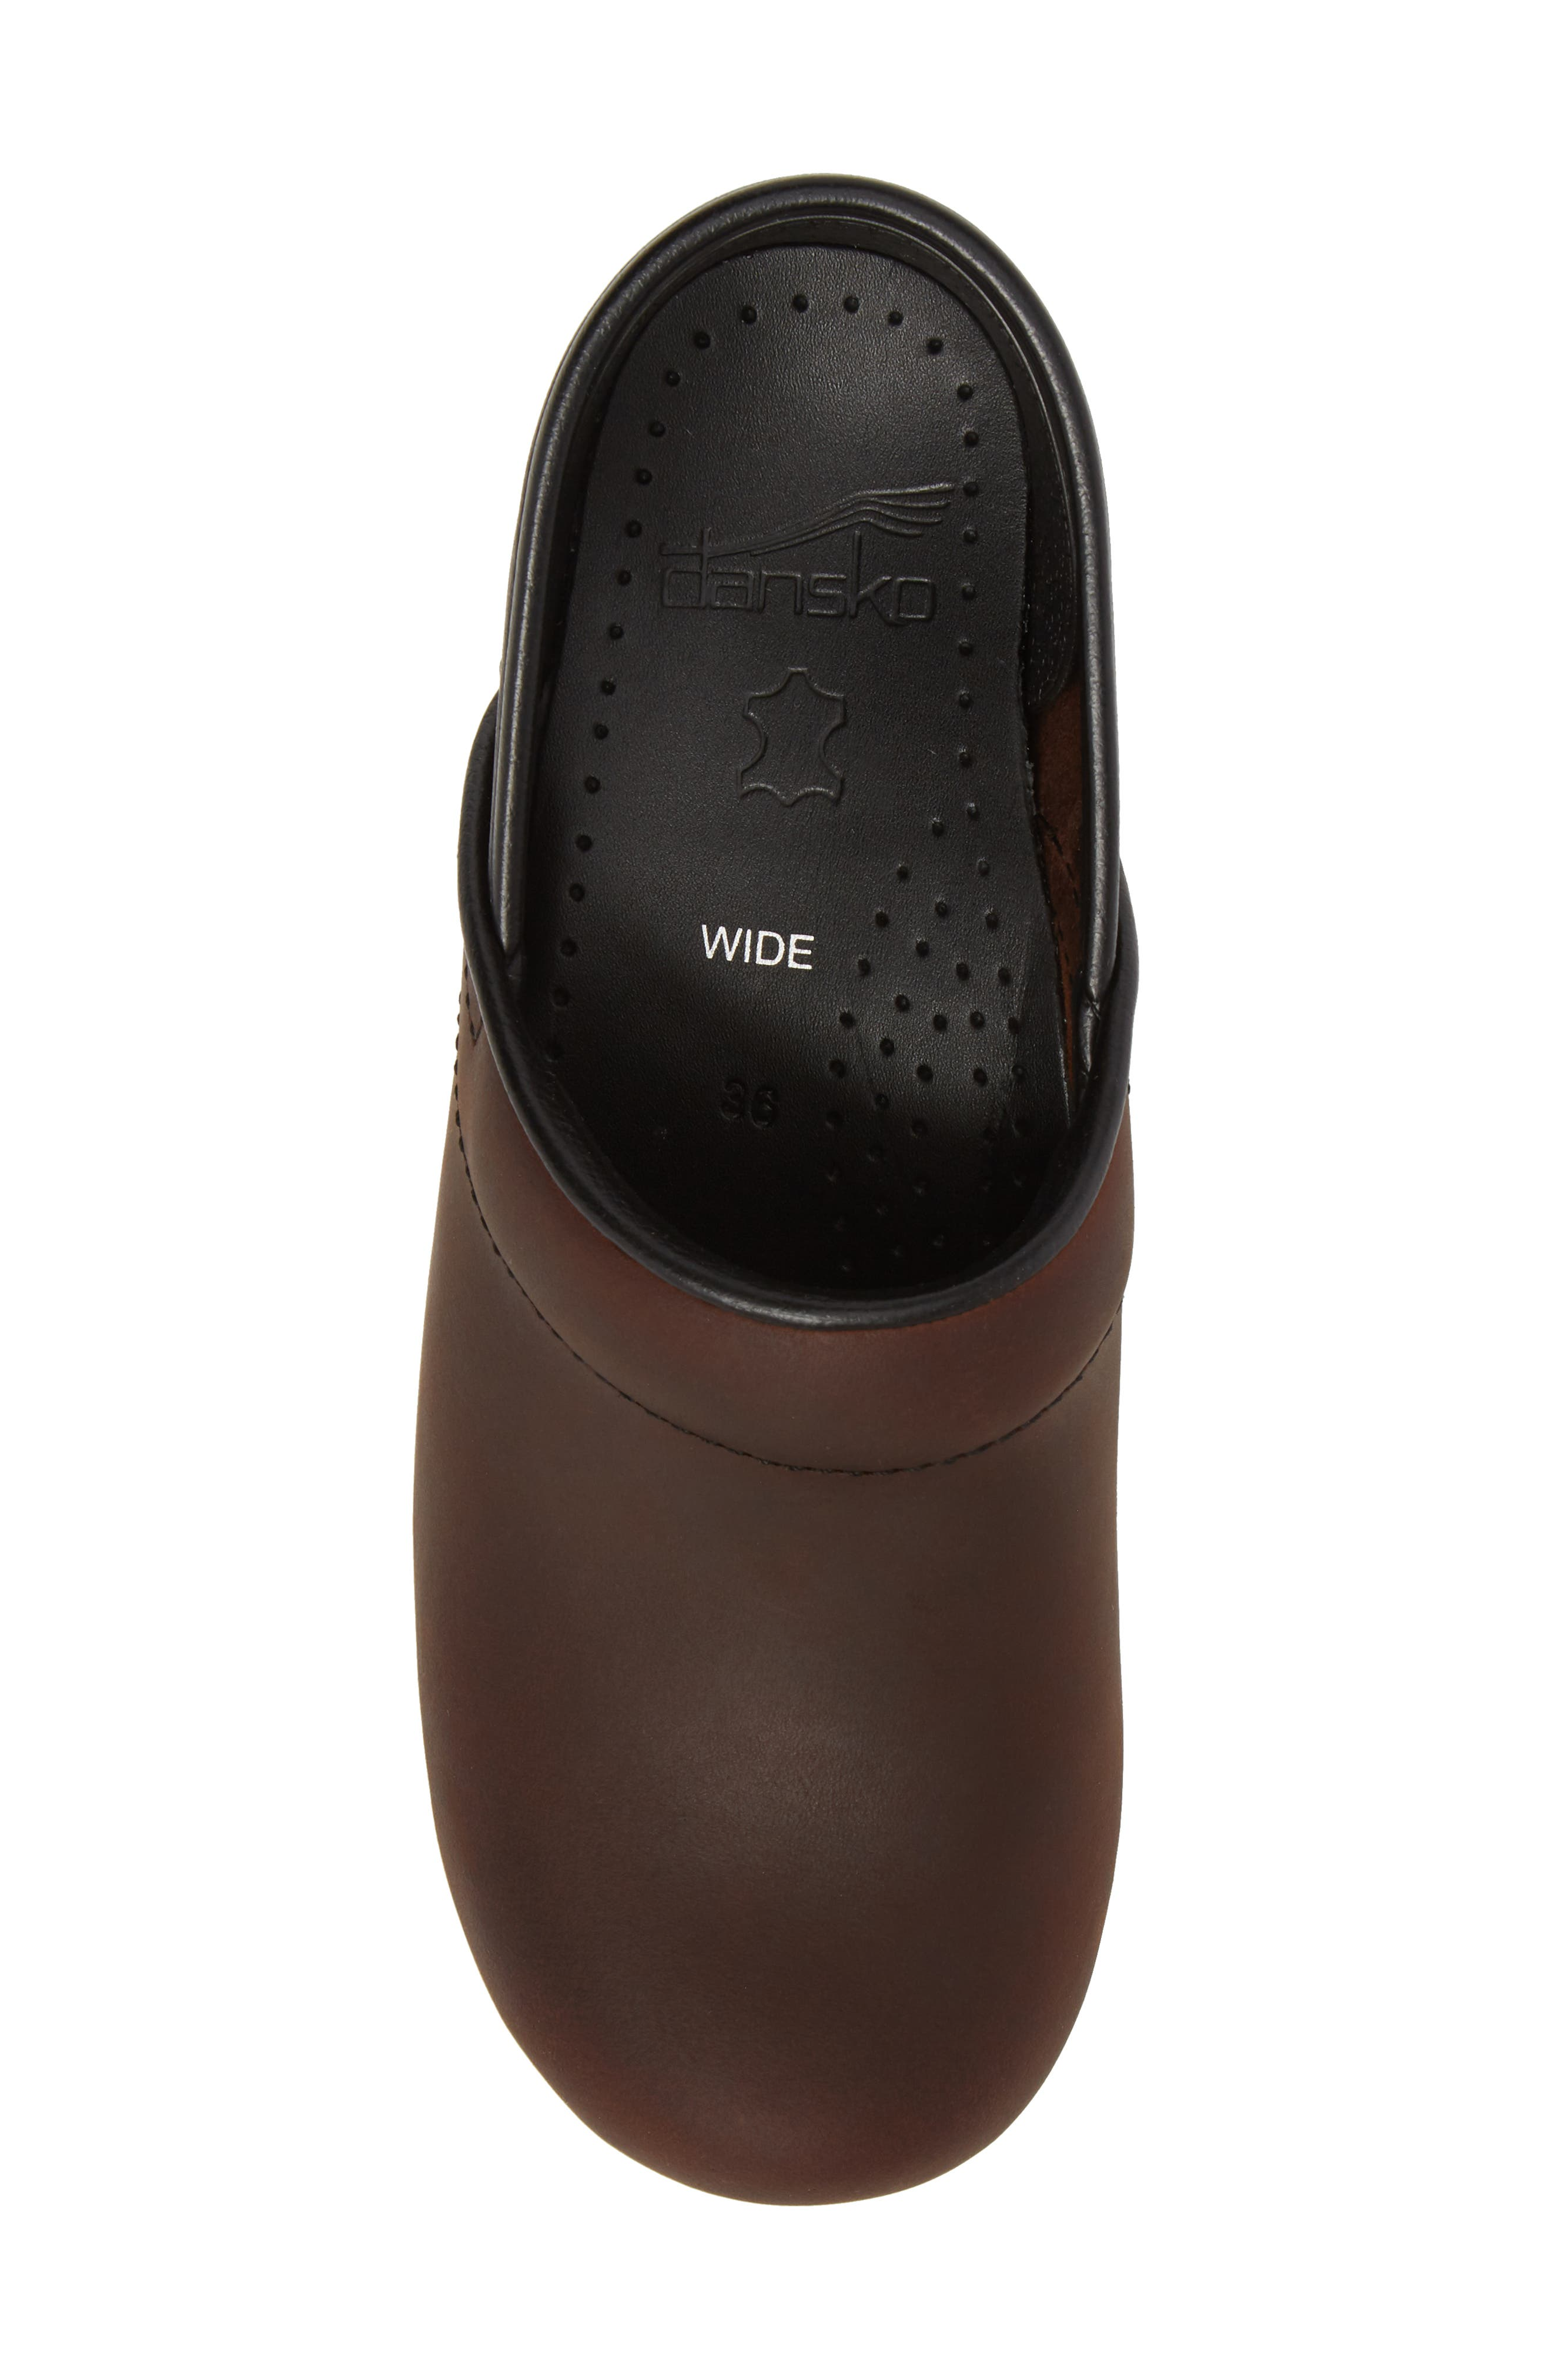 Wide Pro Clog,                             Alternate thumbnail 5, color,                             Antique Brown/ Black Leather